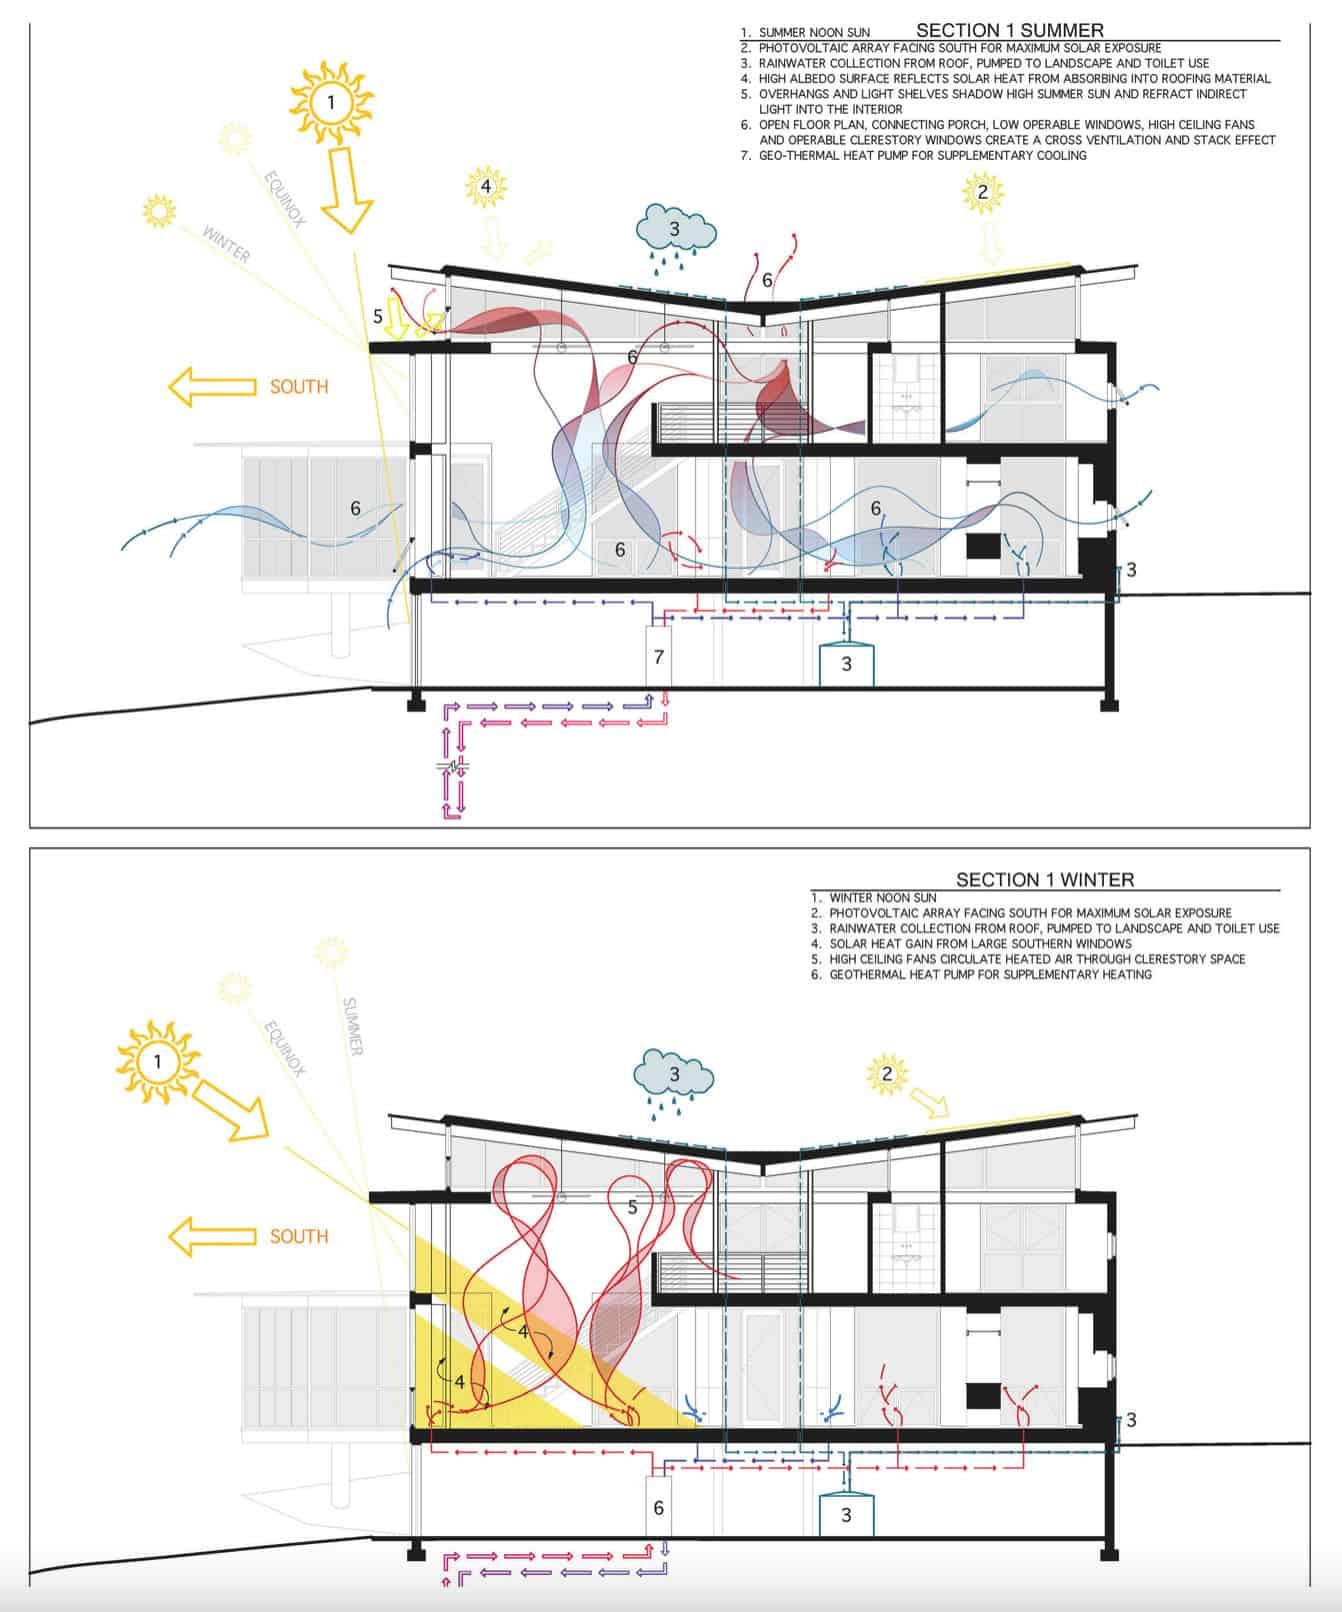 leed-platinum-certifited-modernist-house-section-plan